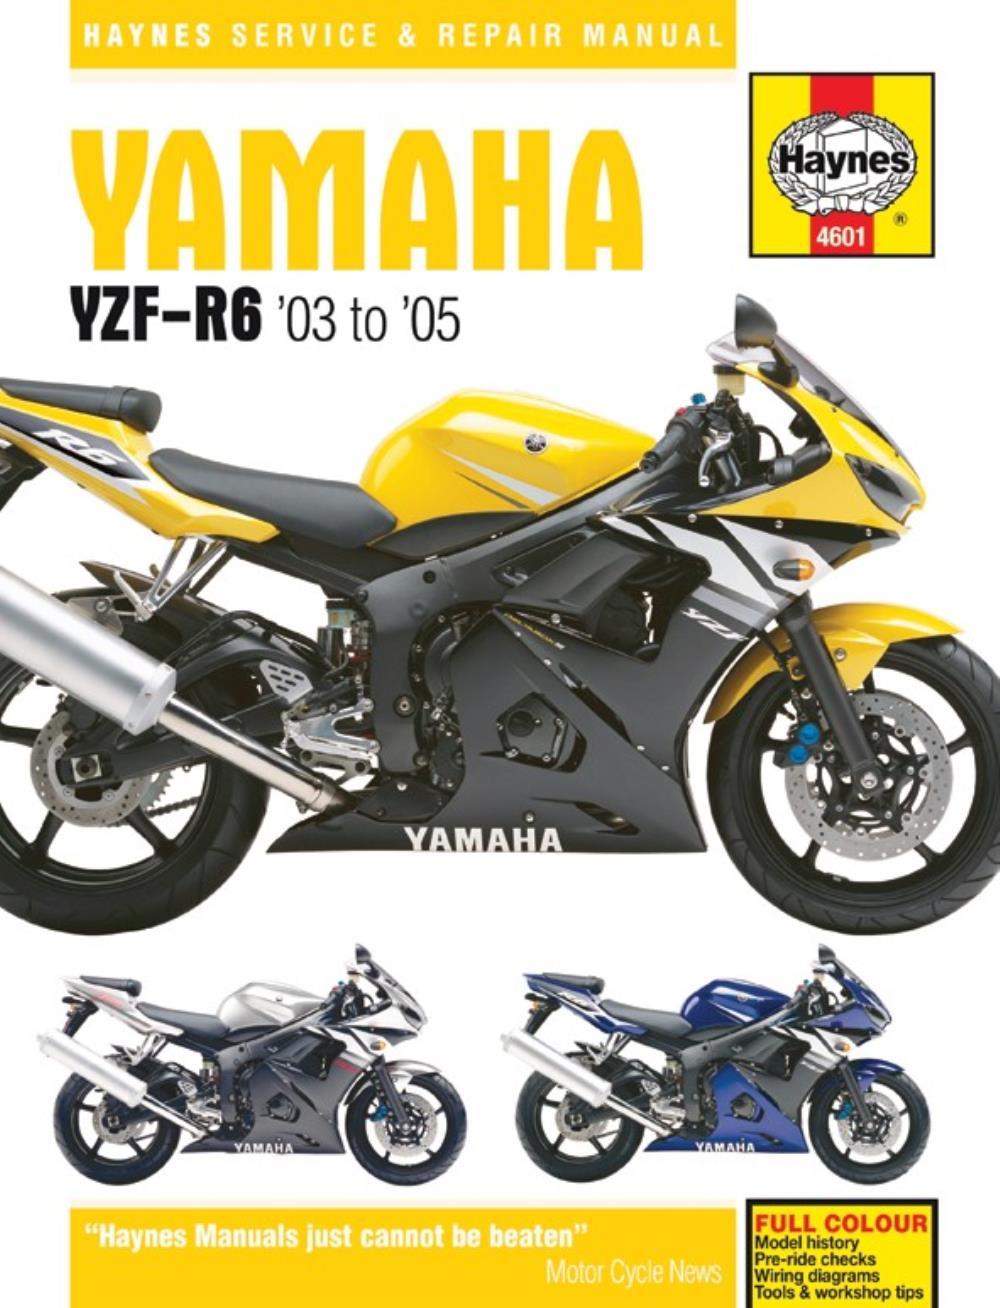 Haynes Manual 4601 Yam Yzf R6 03 05 Ebay Wiring Diagram Image Is Loading